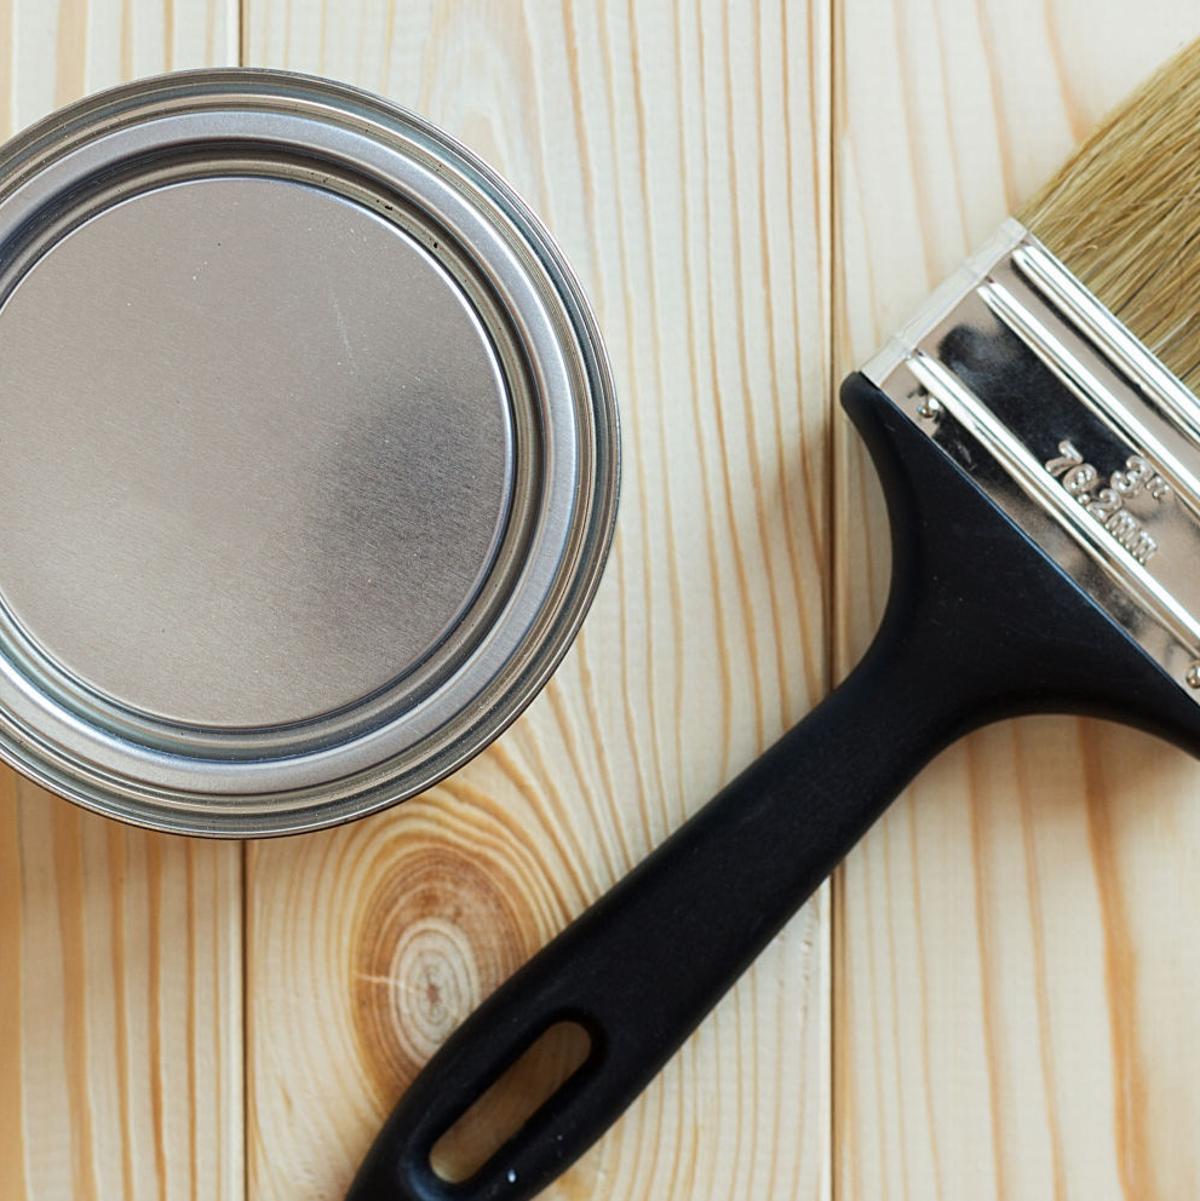 Illegal contractors have little incentive under Arizona law